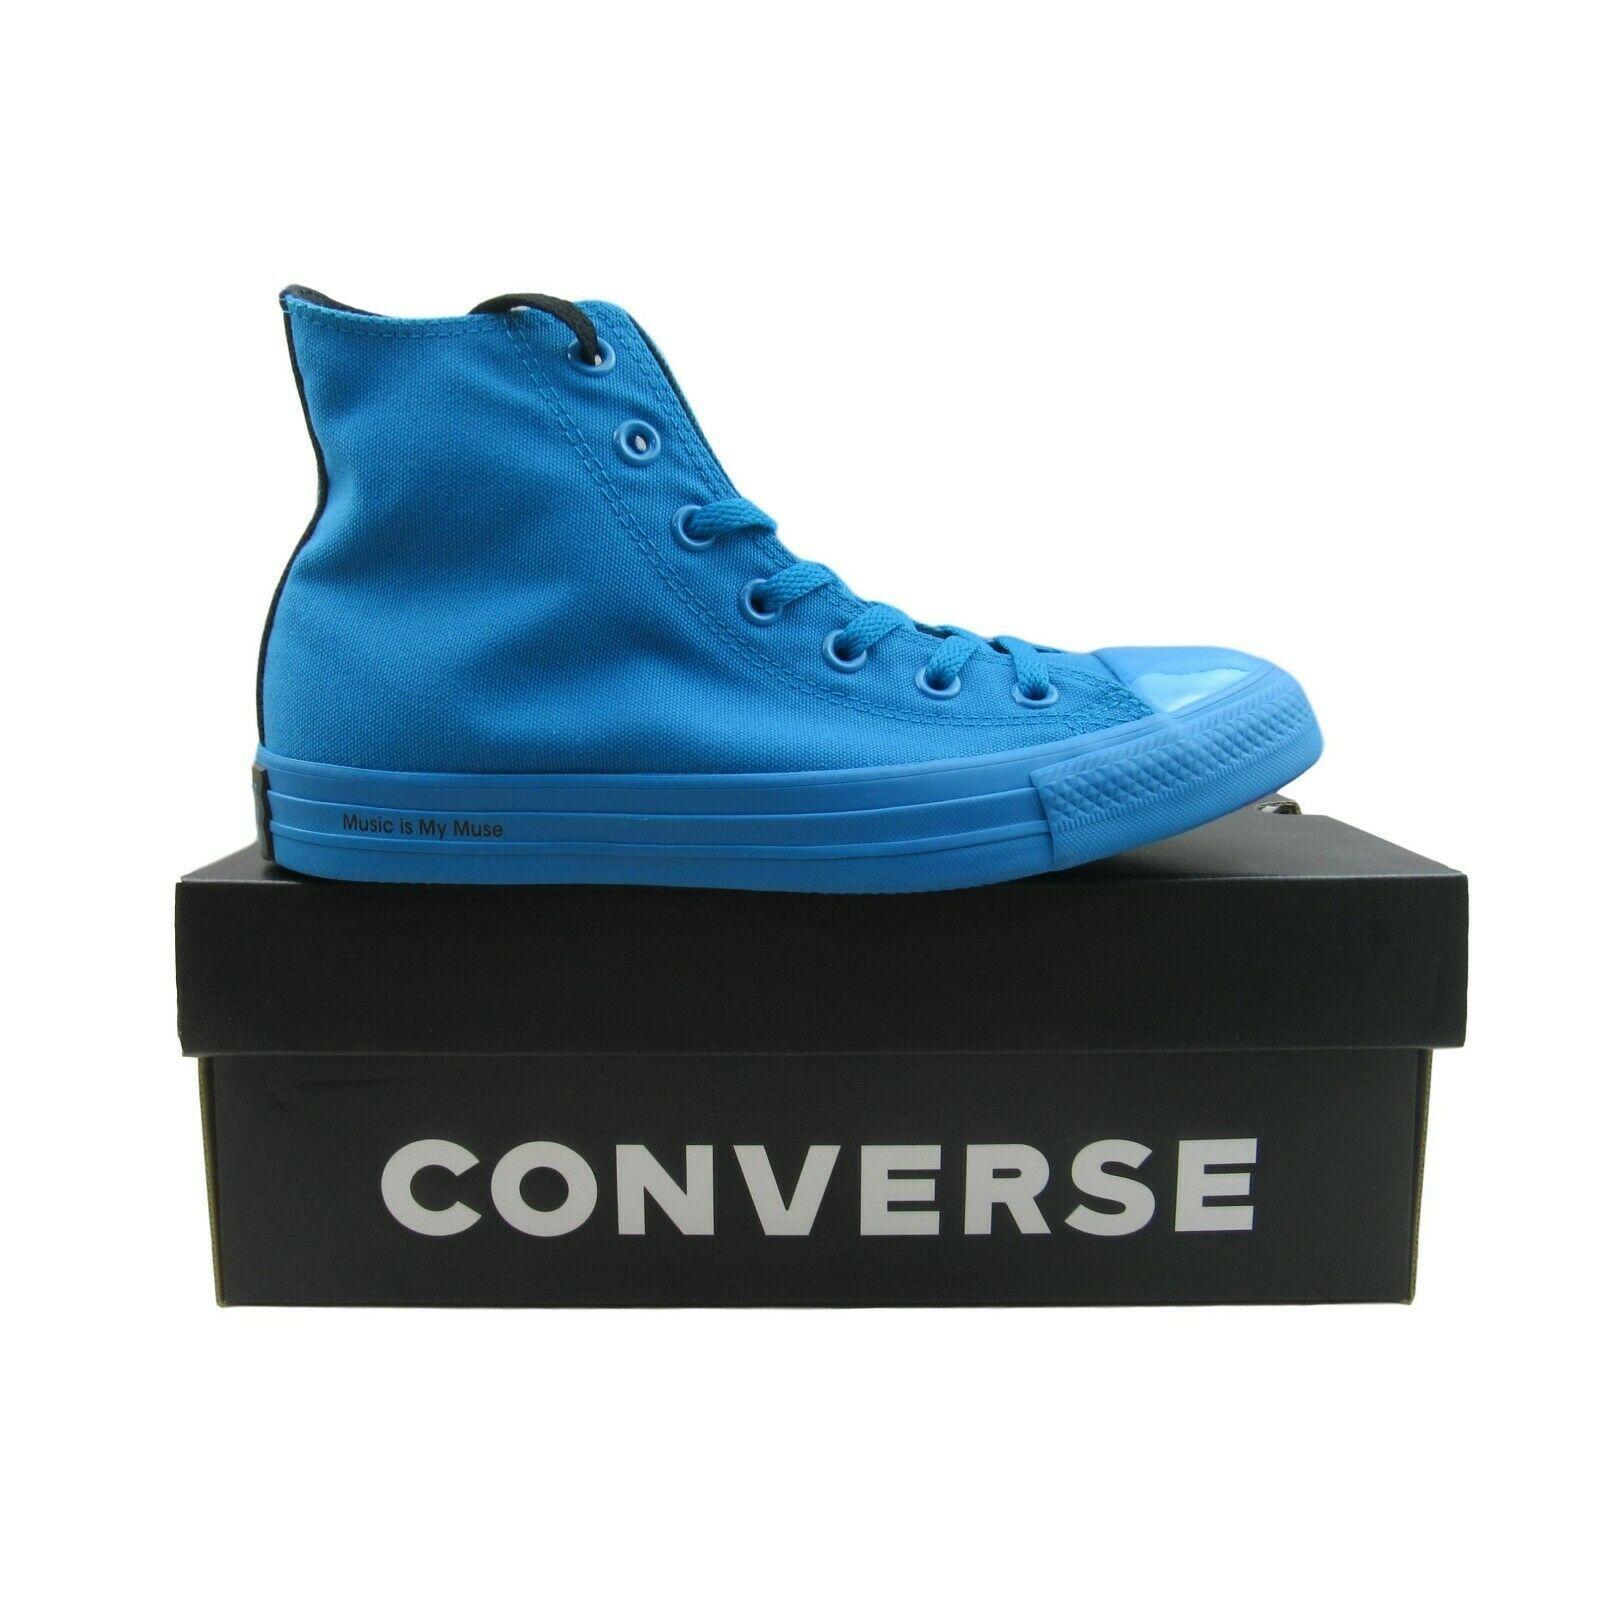 Converse x OPI Chuck Taylor All Star HI Mens Size 6 / Womens Size 8 Blue 165659C - $59.35